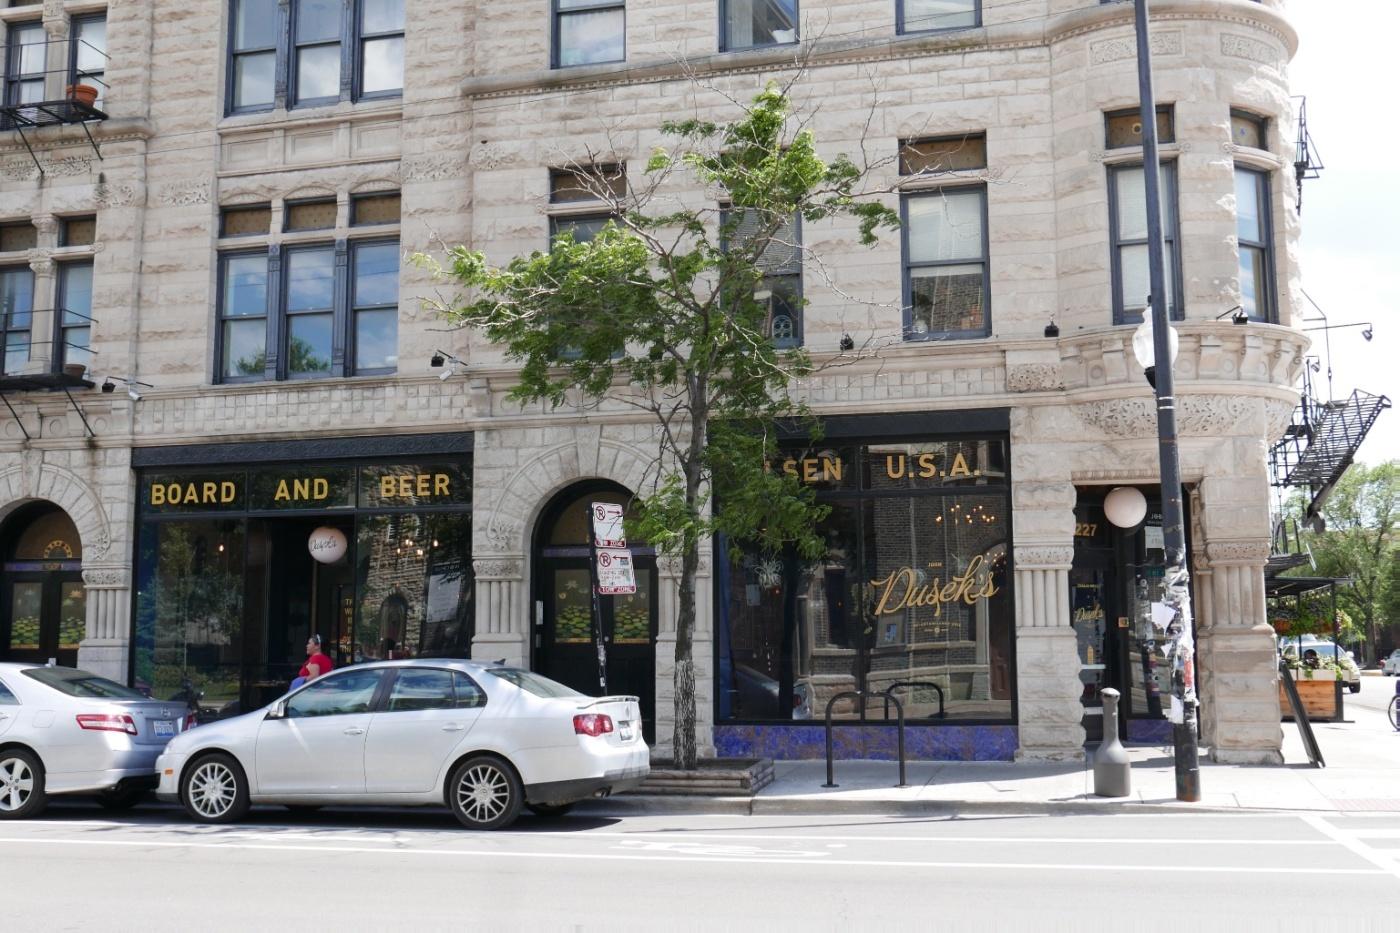 Dusek's, 1227 W 18th St, Chicago, IL